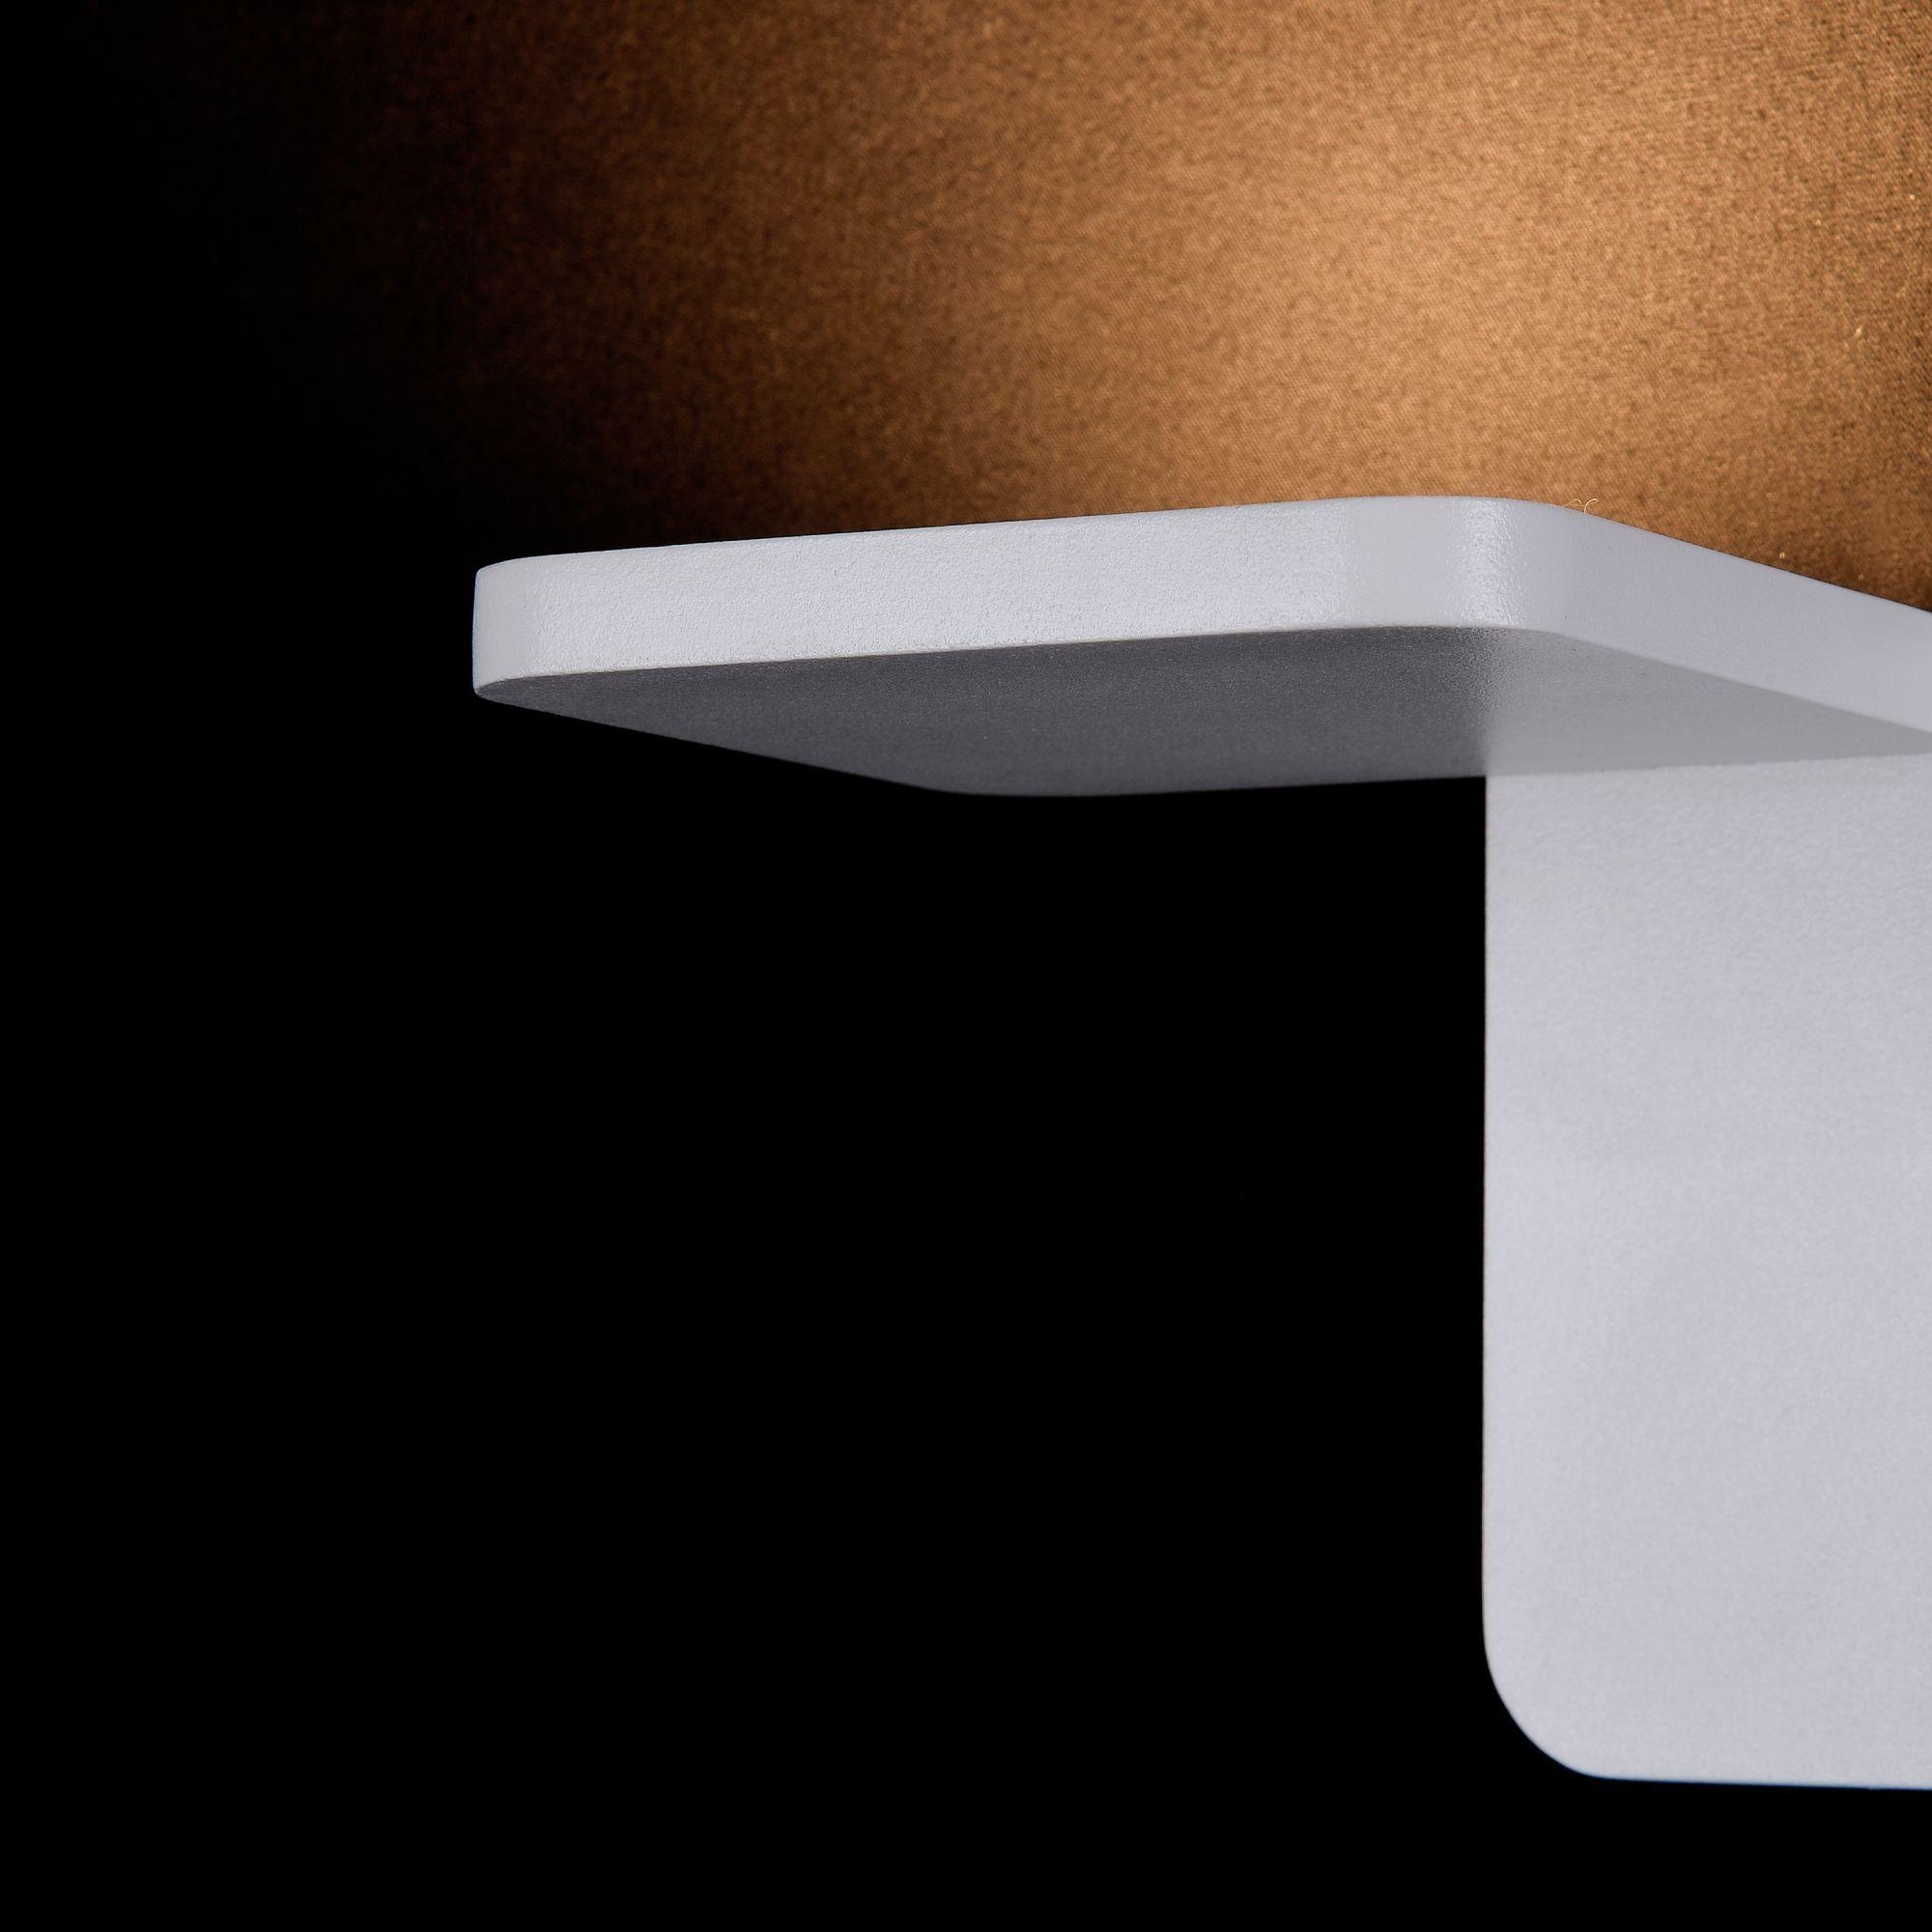 Настенный светодиодный светильник Maytoni Trame C807WL-L7W, LED SMD 2835 7W 3000K 350lm CRI84, белый, металл, стекло - фото 5